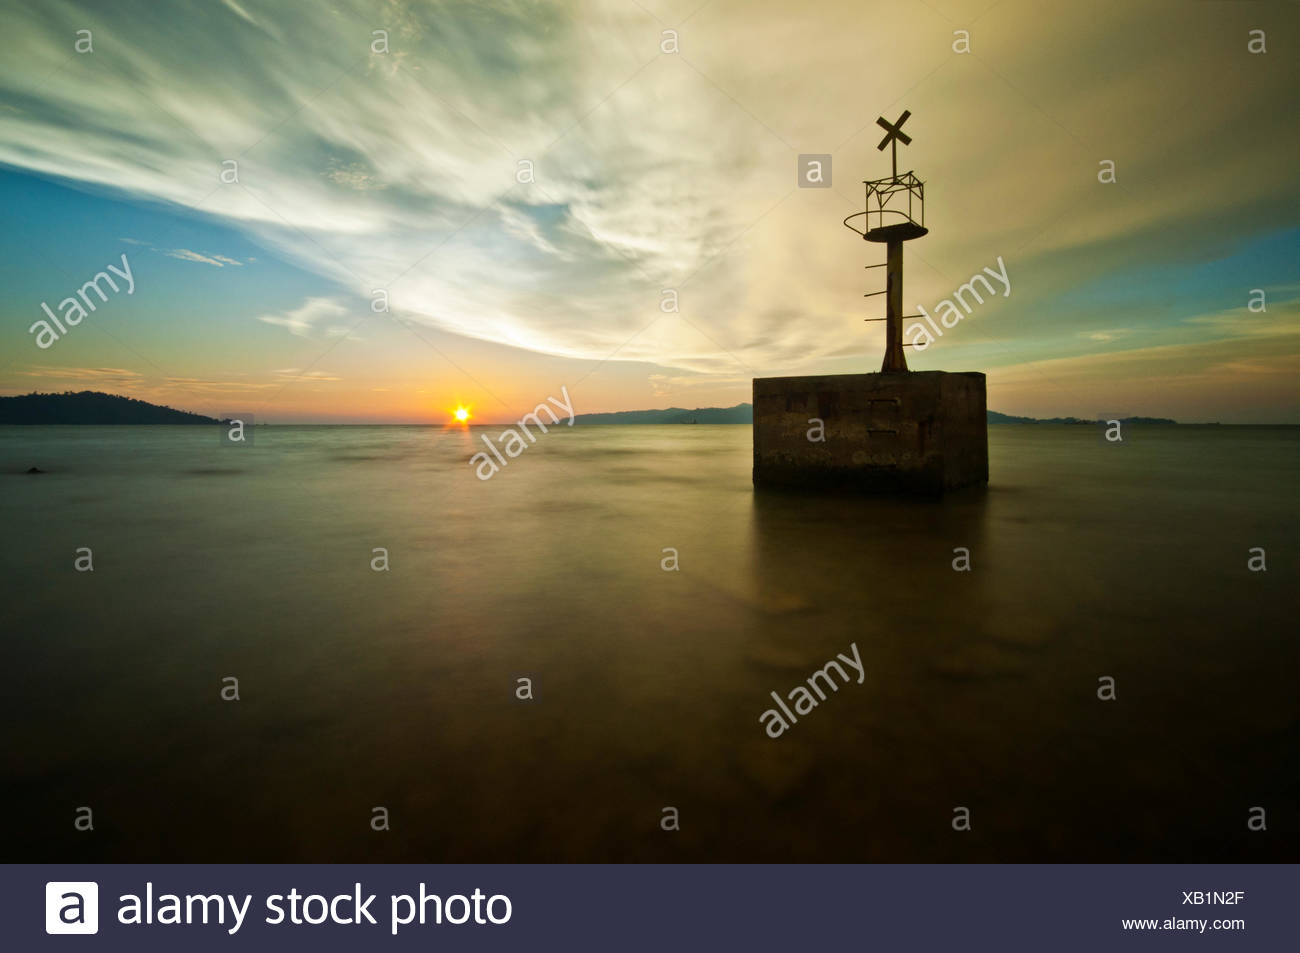 Malaysia, Sabah, Kota Kinabalu, Sunset over sea - Stock Image